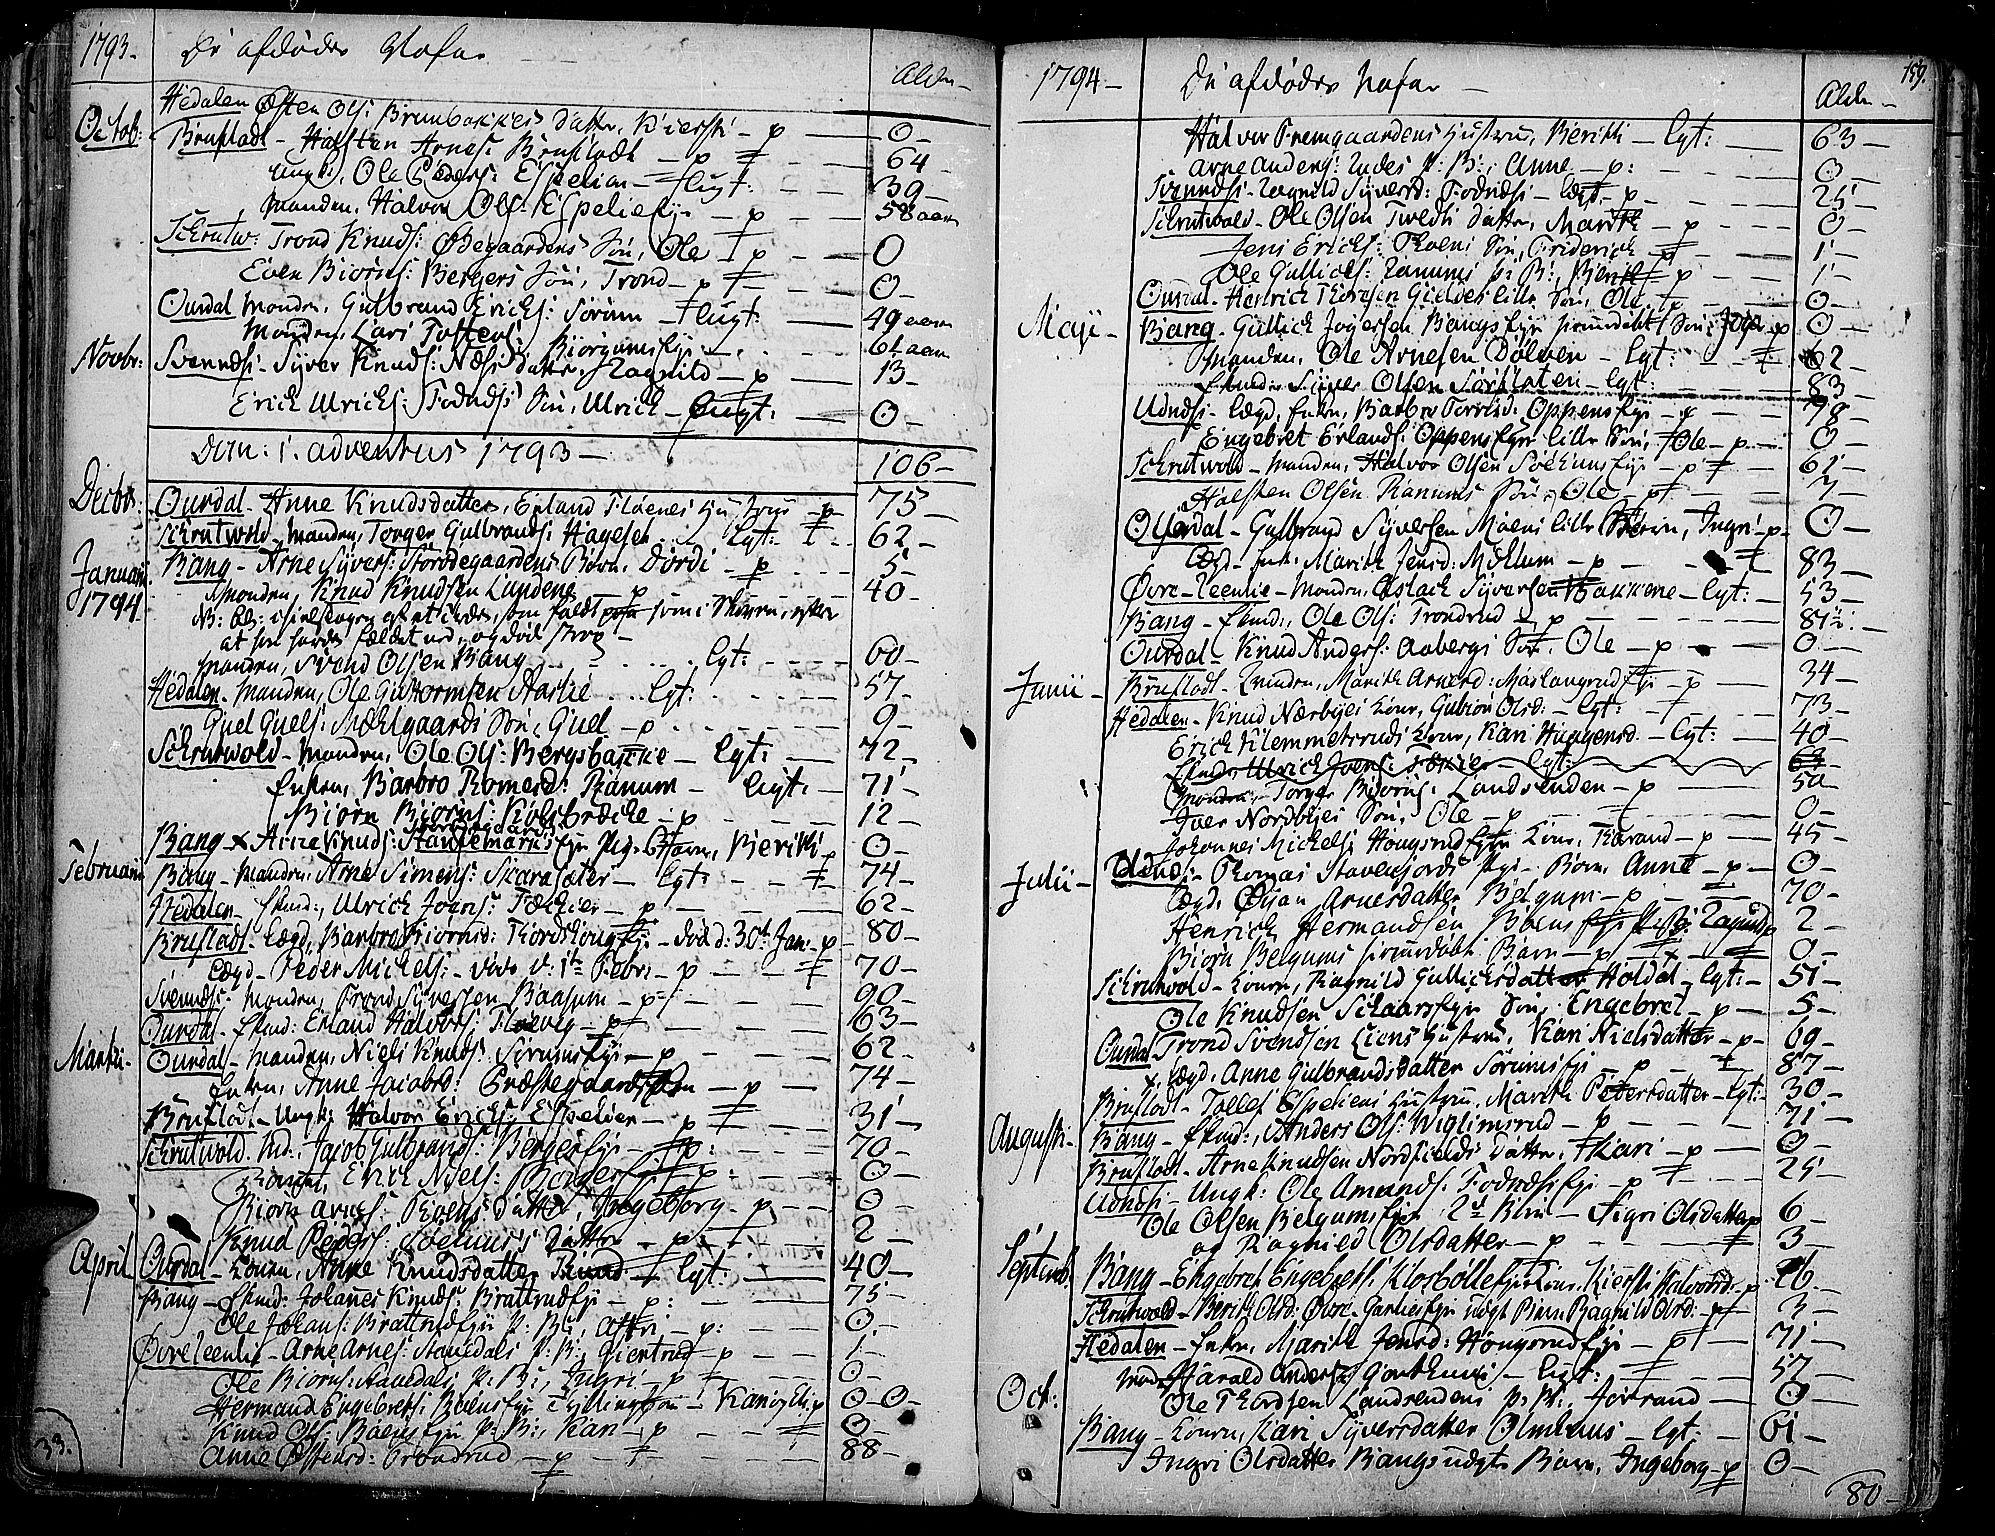 SAH, Aurdal prestekontor, Ministerialbok nr. 6, 1781-1804, s. 159